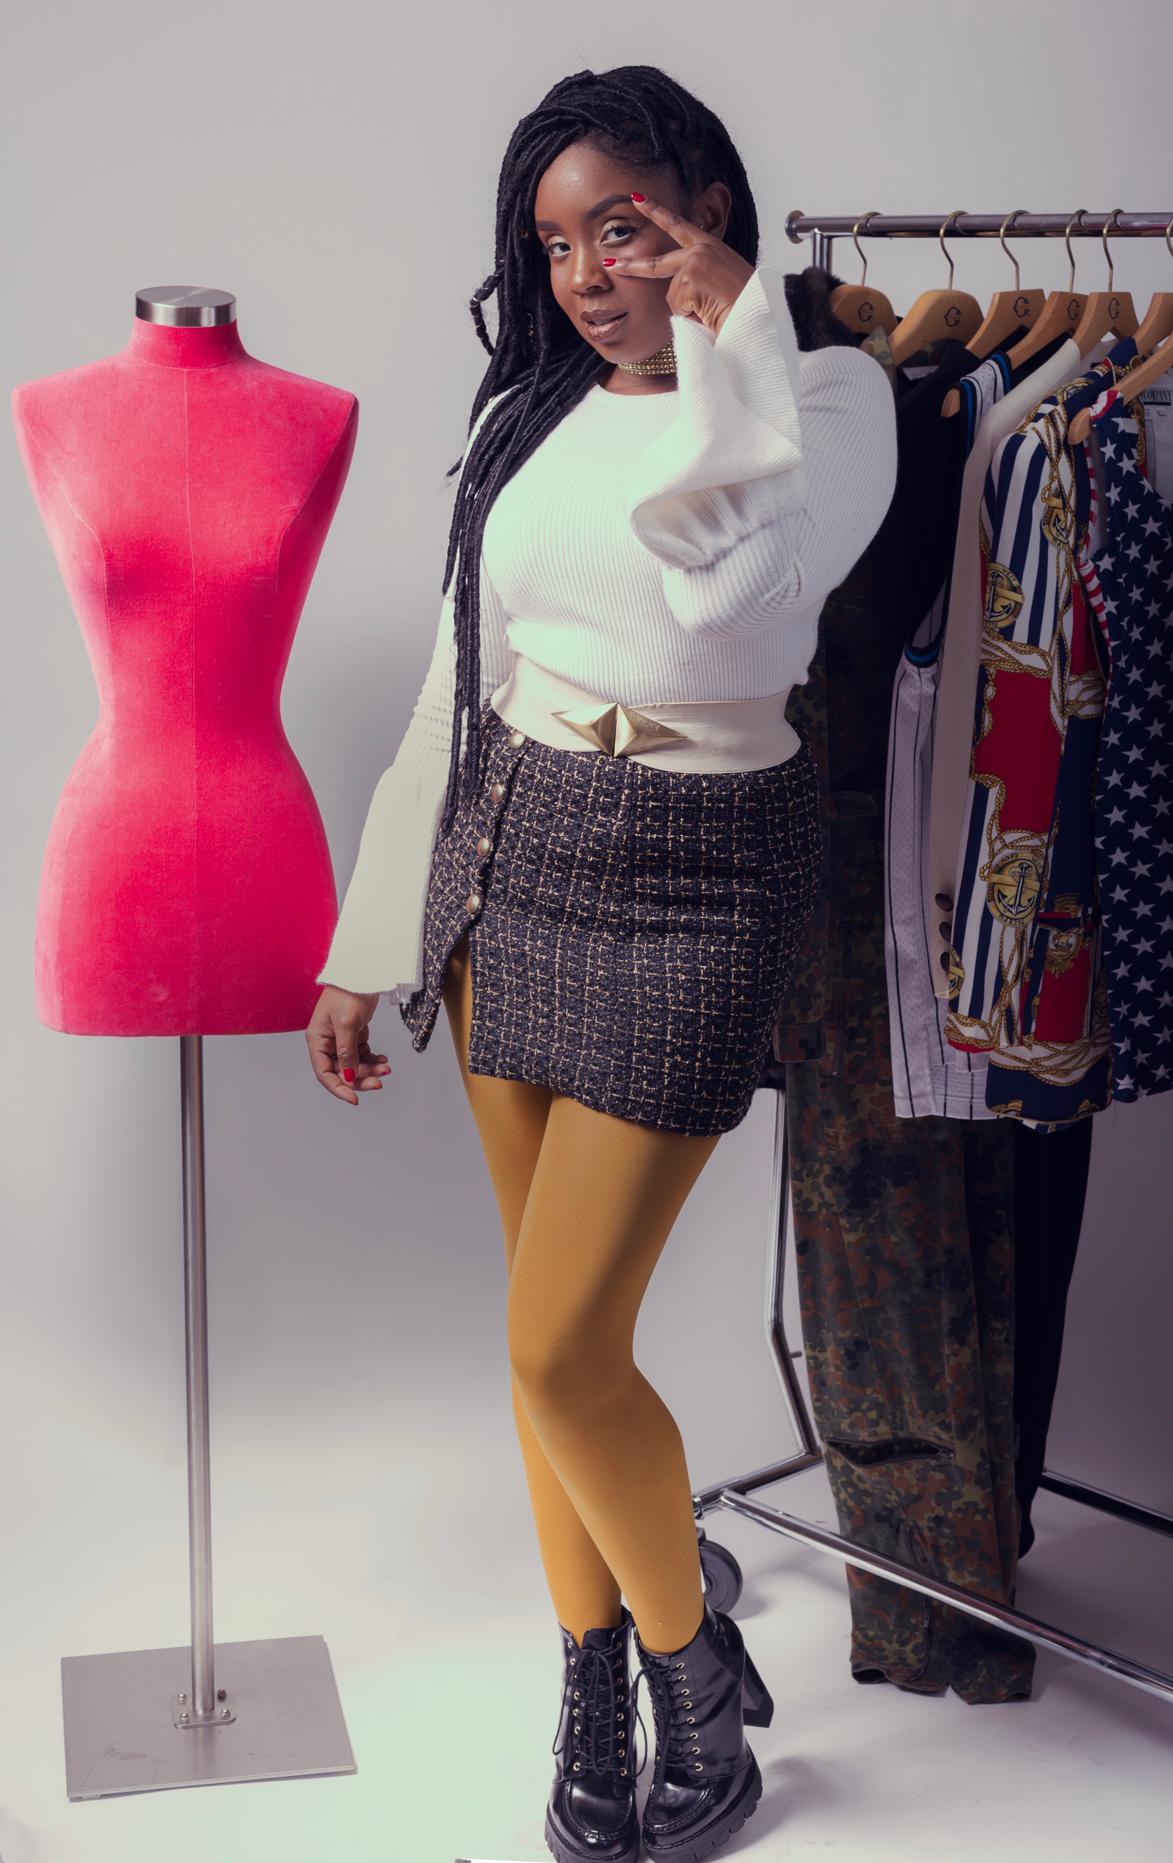 fashionista-photo-shoot-chamber-photography-antoine-hart-3.jpg